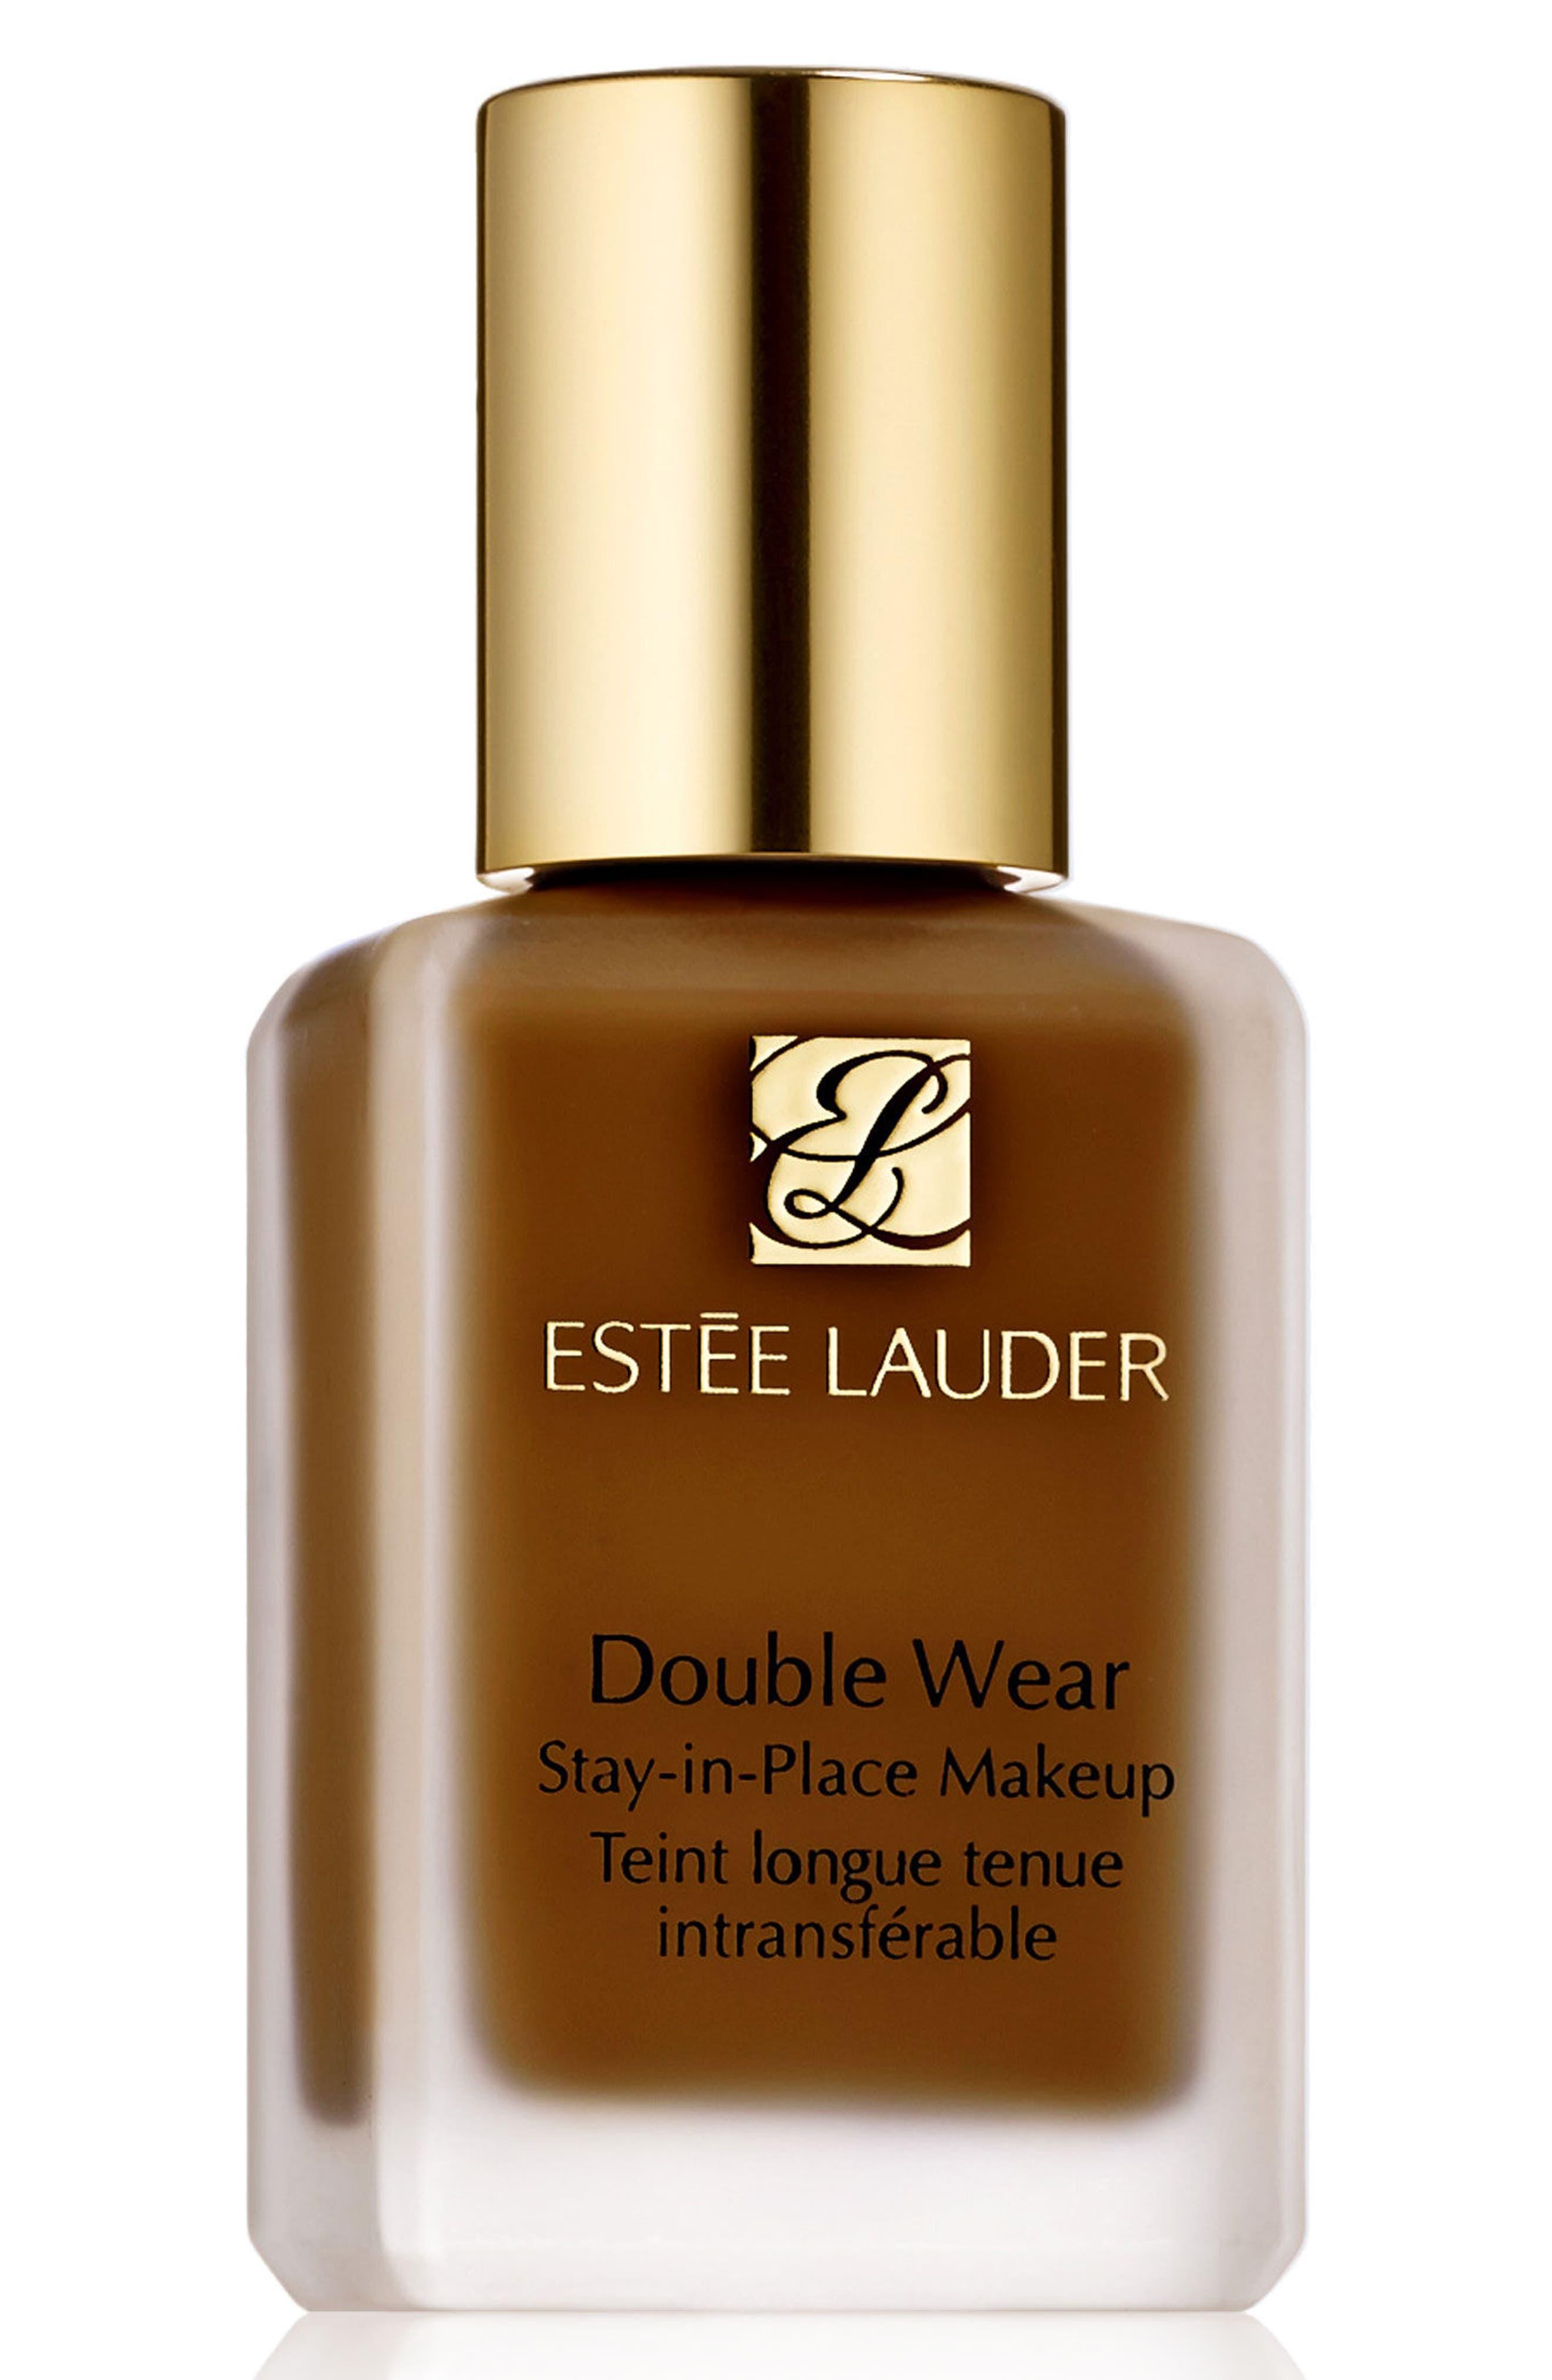 Estee Lauder Double Wear Stay-In-Place Liquid Makeup - 7C2 Sienna